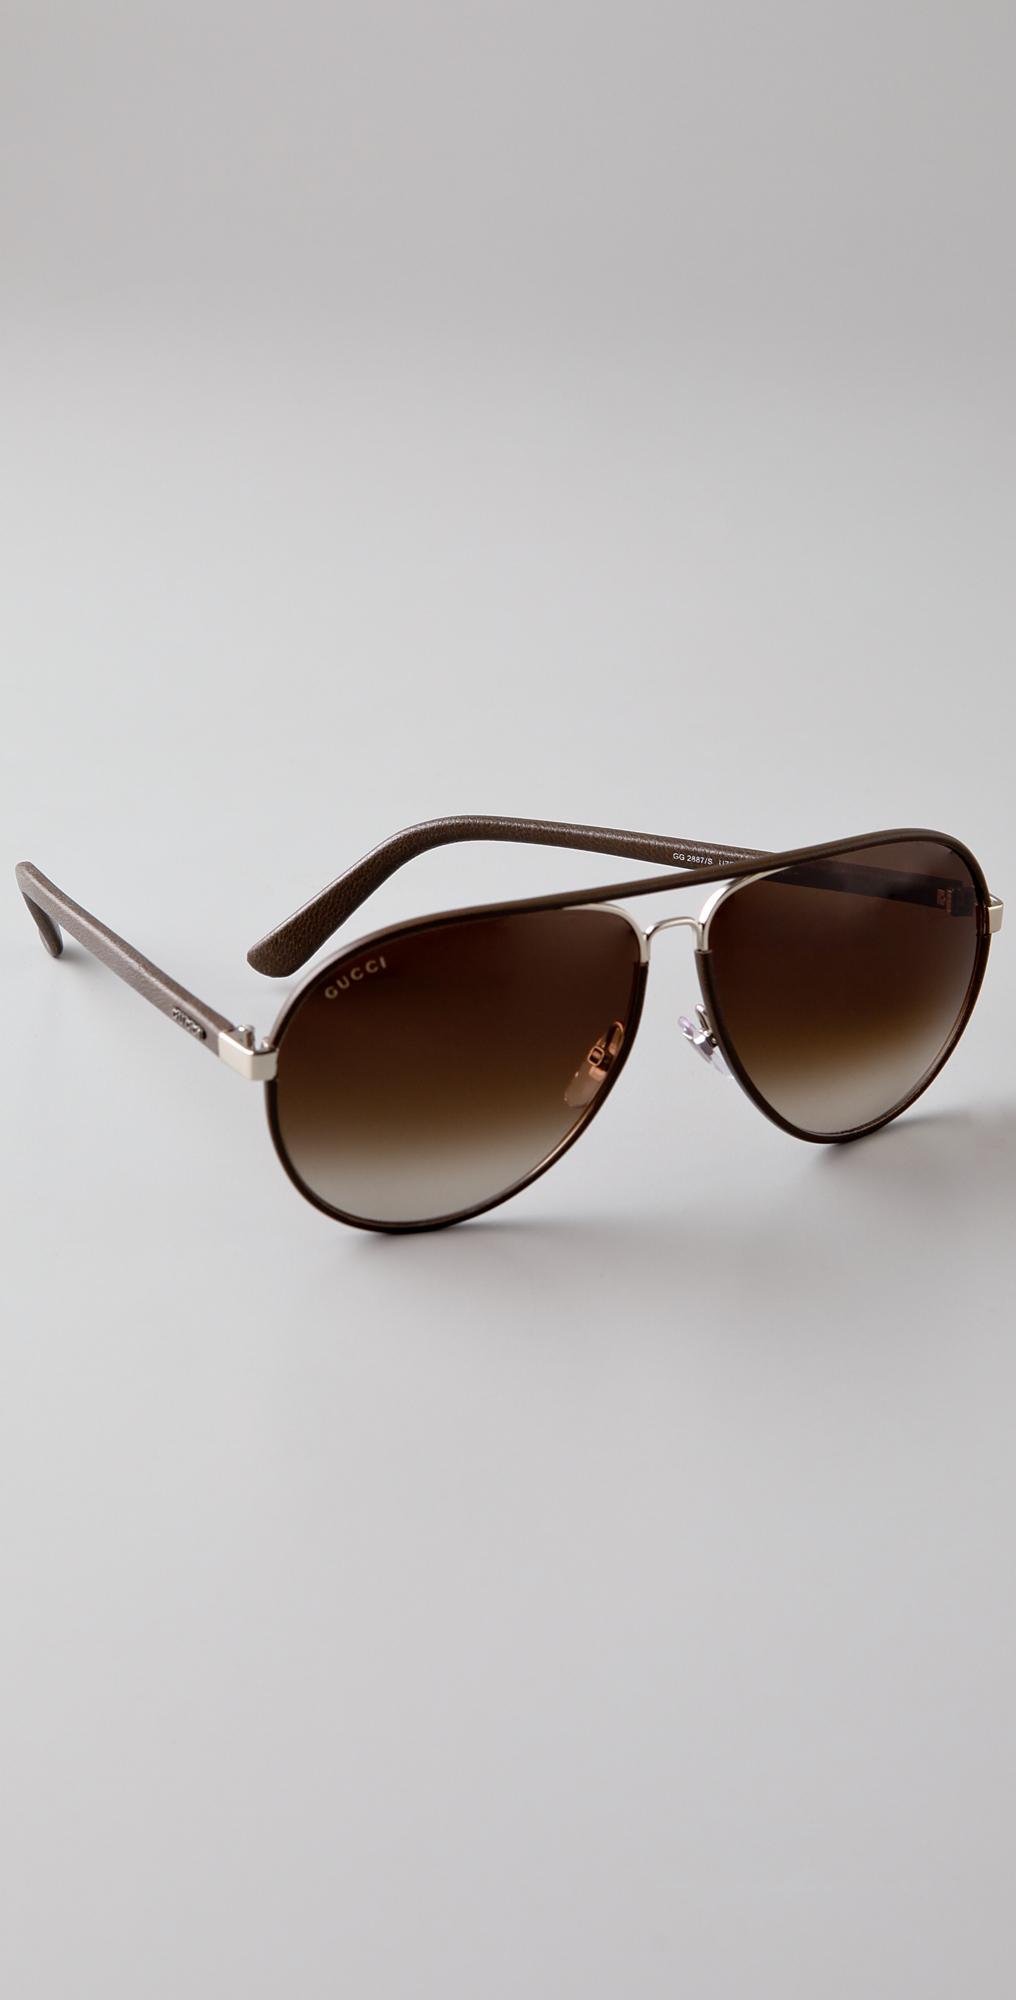 9910af11 Gucci Sunglasses Leather Aviator « Heritage Malta